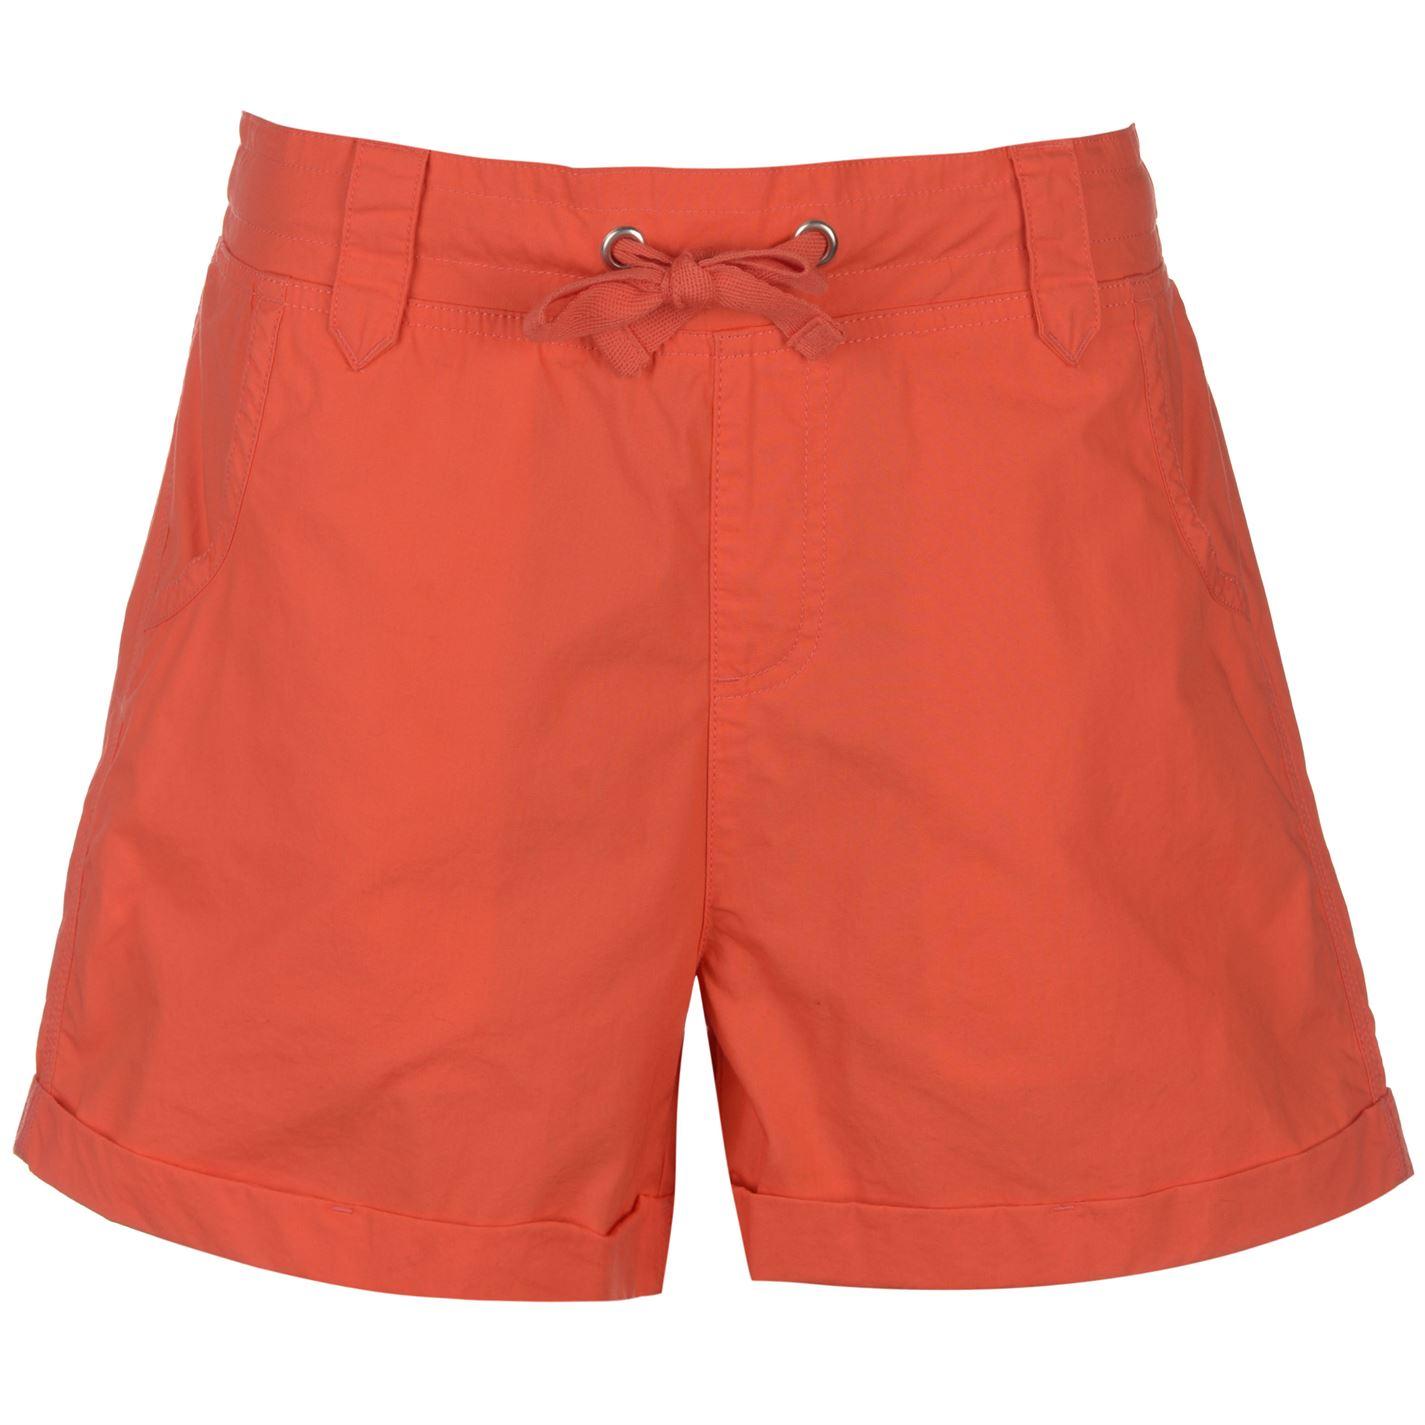 Šortky Full Circle Poplin Shorts Ladies - Glami.sk 099a7887afa